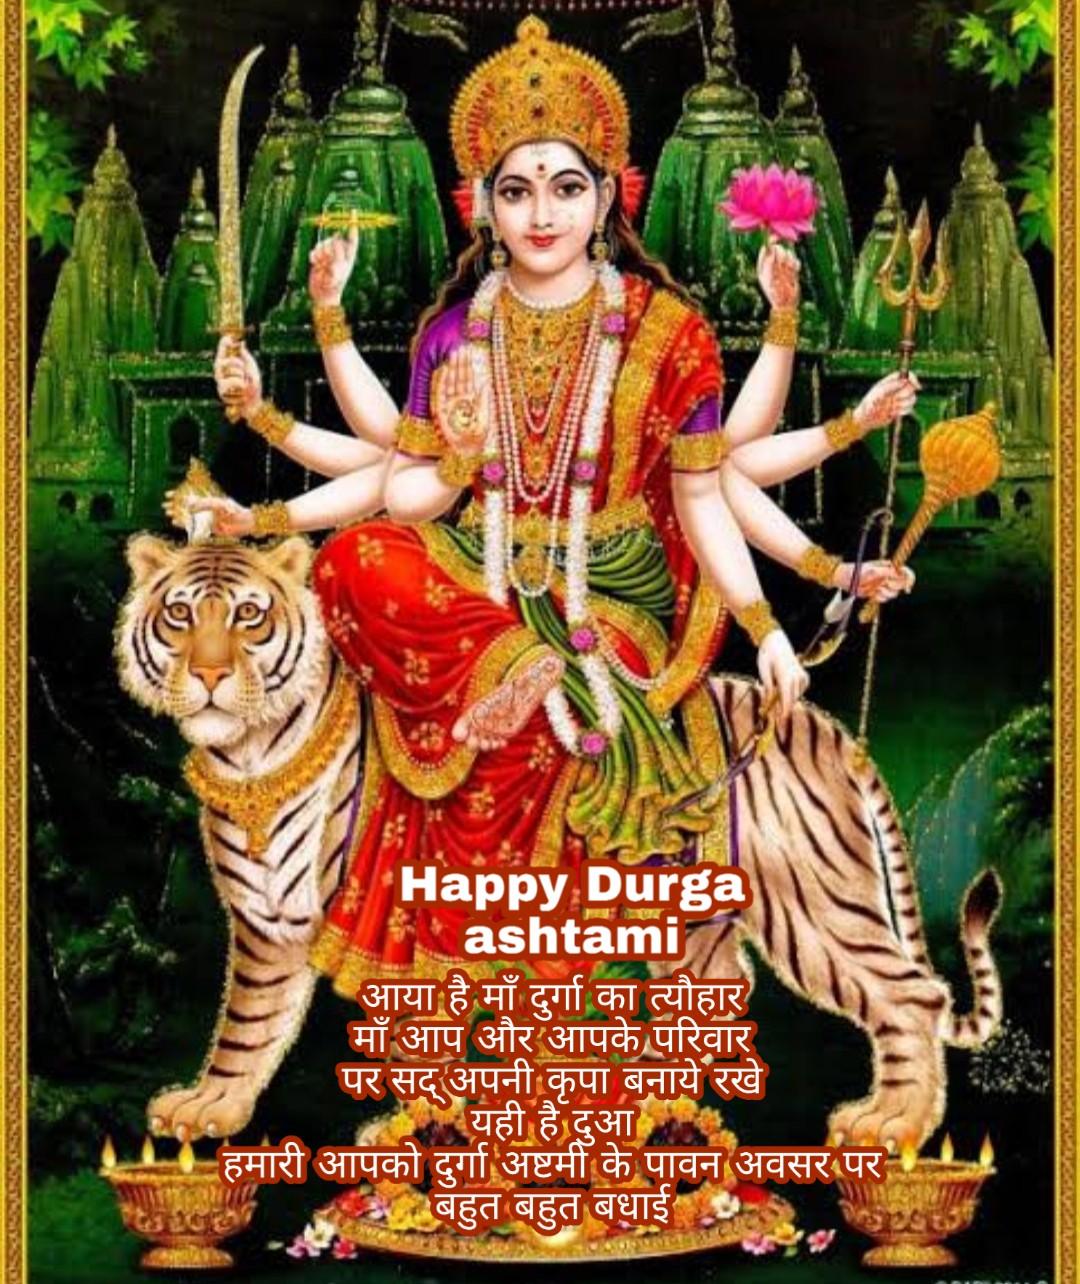 Durga ashtami status whatsapp status